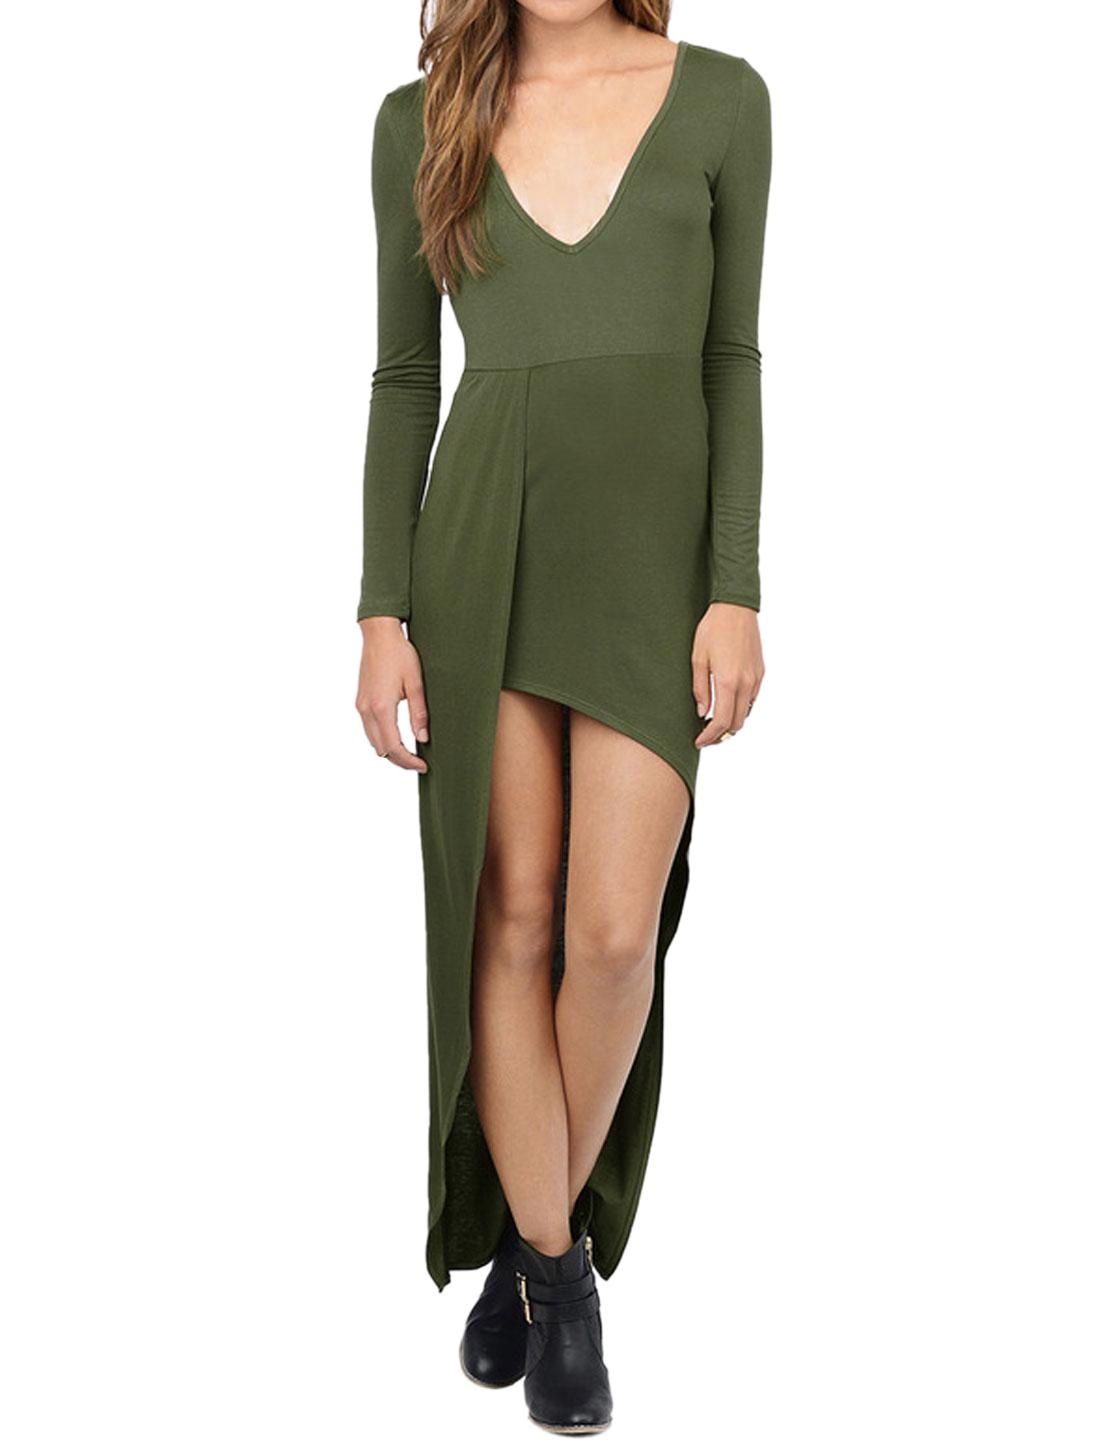 Ladies Deep V Neck Long Sleeves Irregular High Low Hem Lonline Top Green M